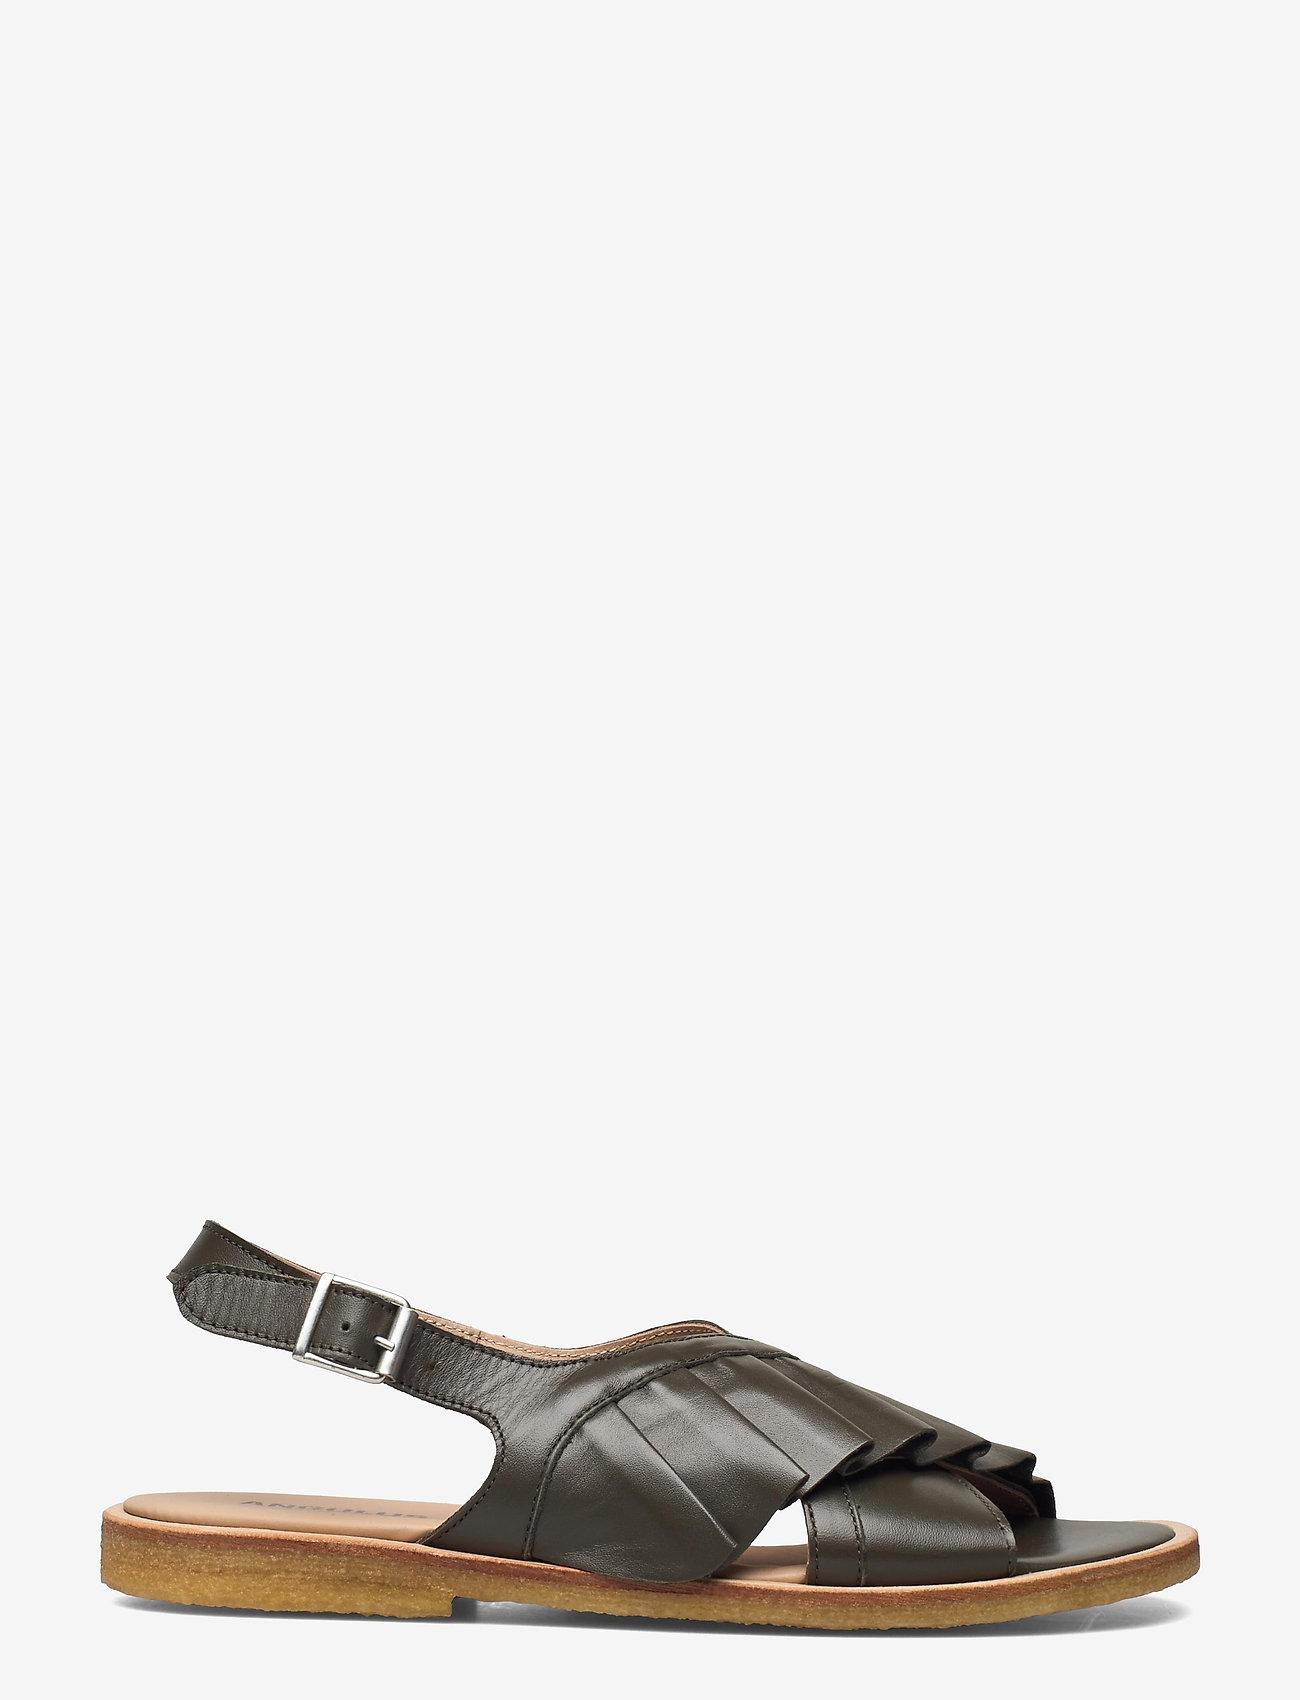 ANGULUS - Sandals - flat - flache sandalen - 1446 olive - 1